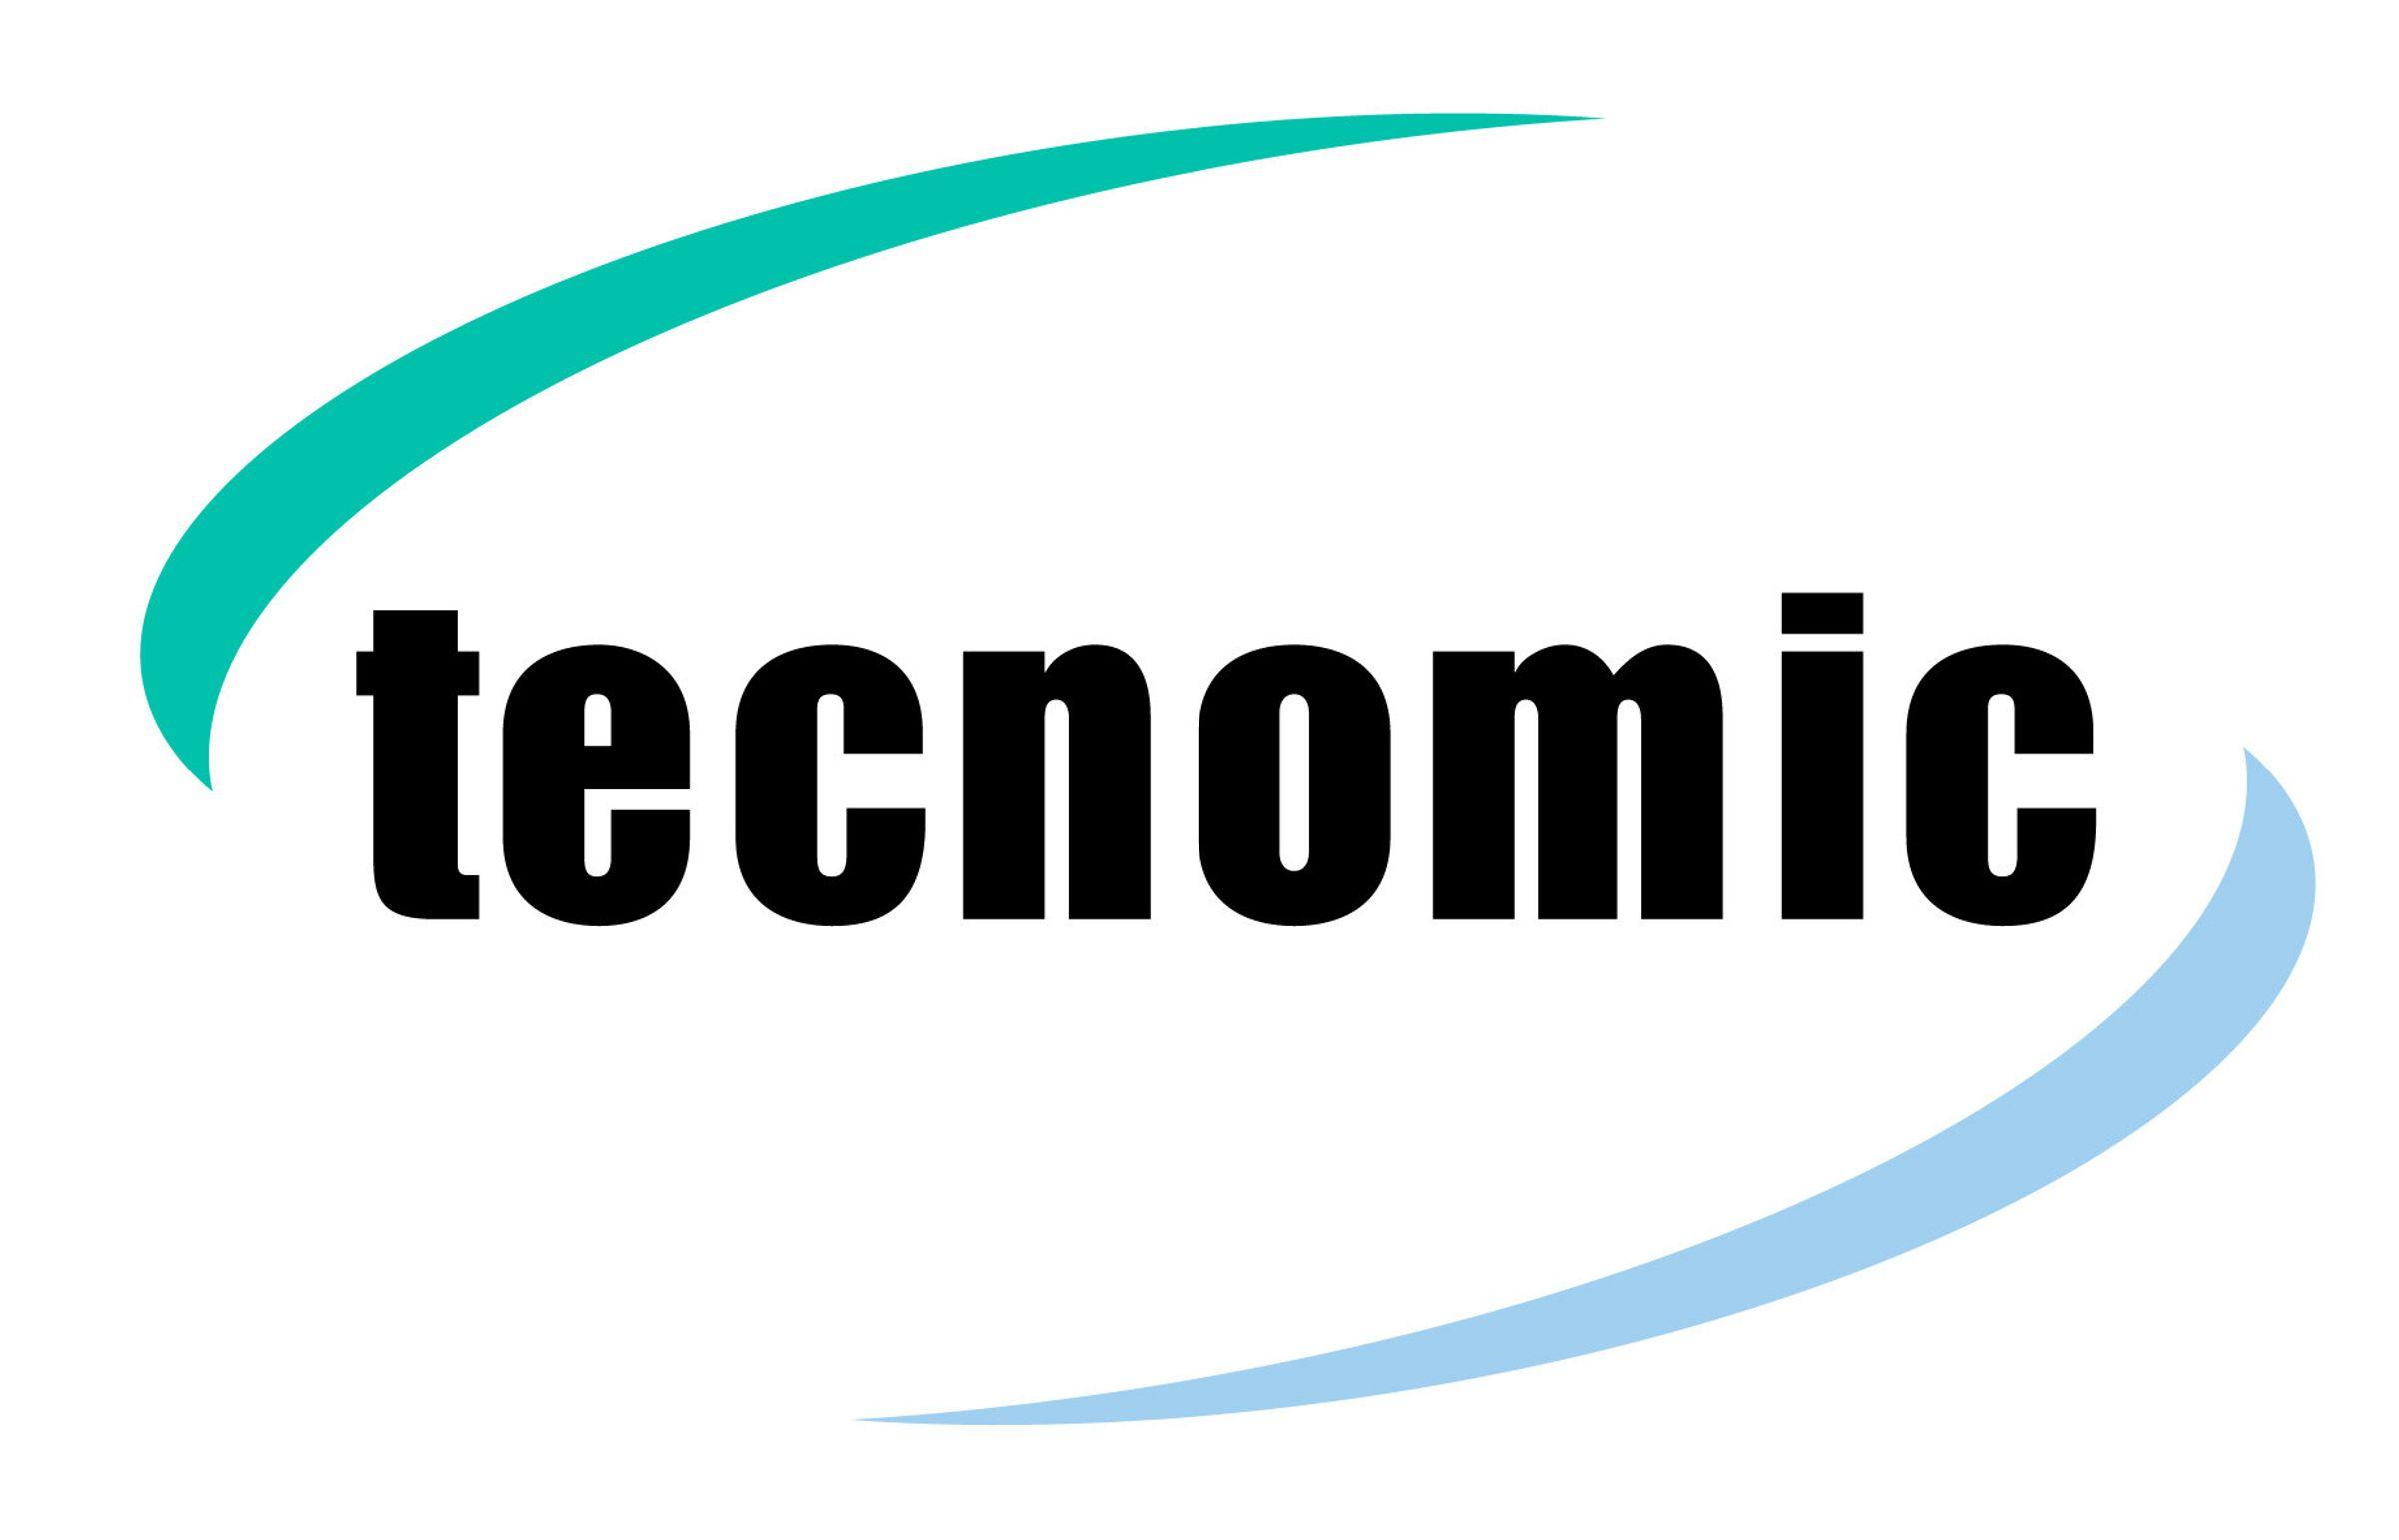 Tecnomic---Logo-image-1